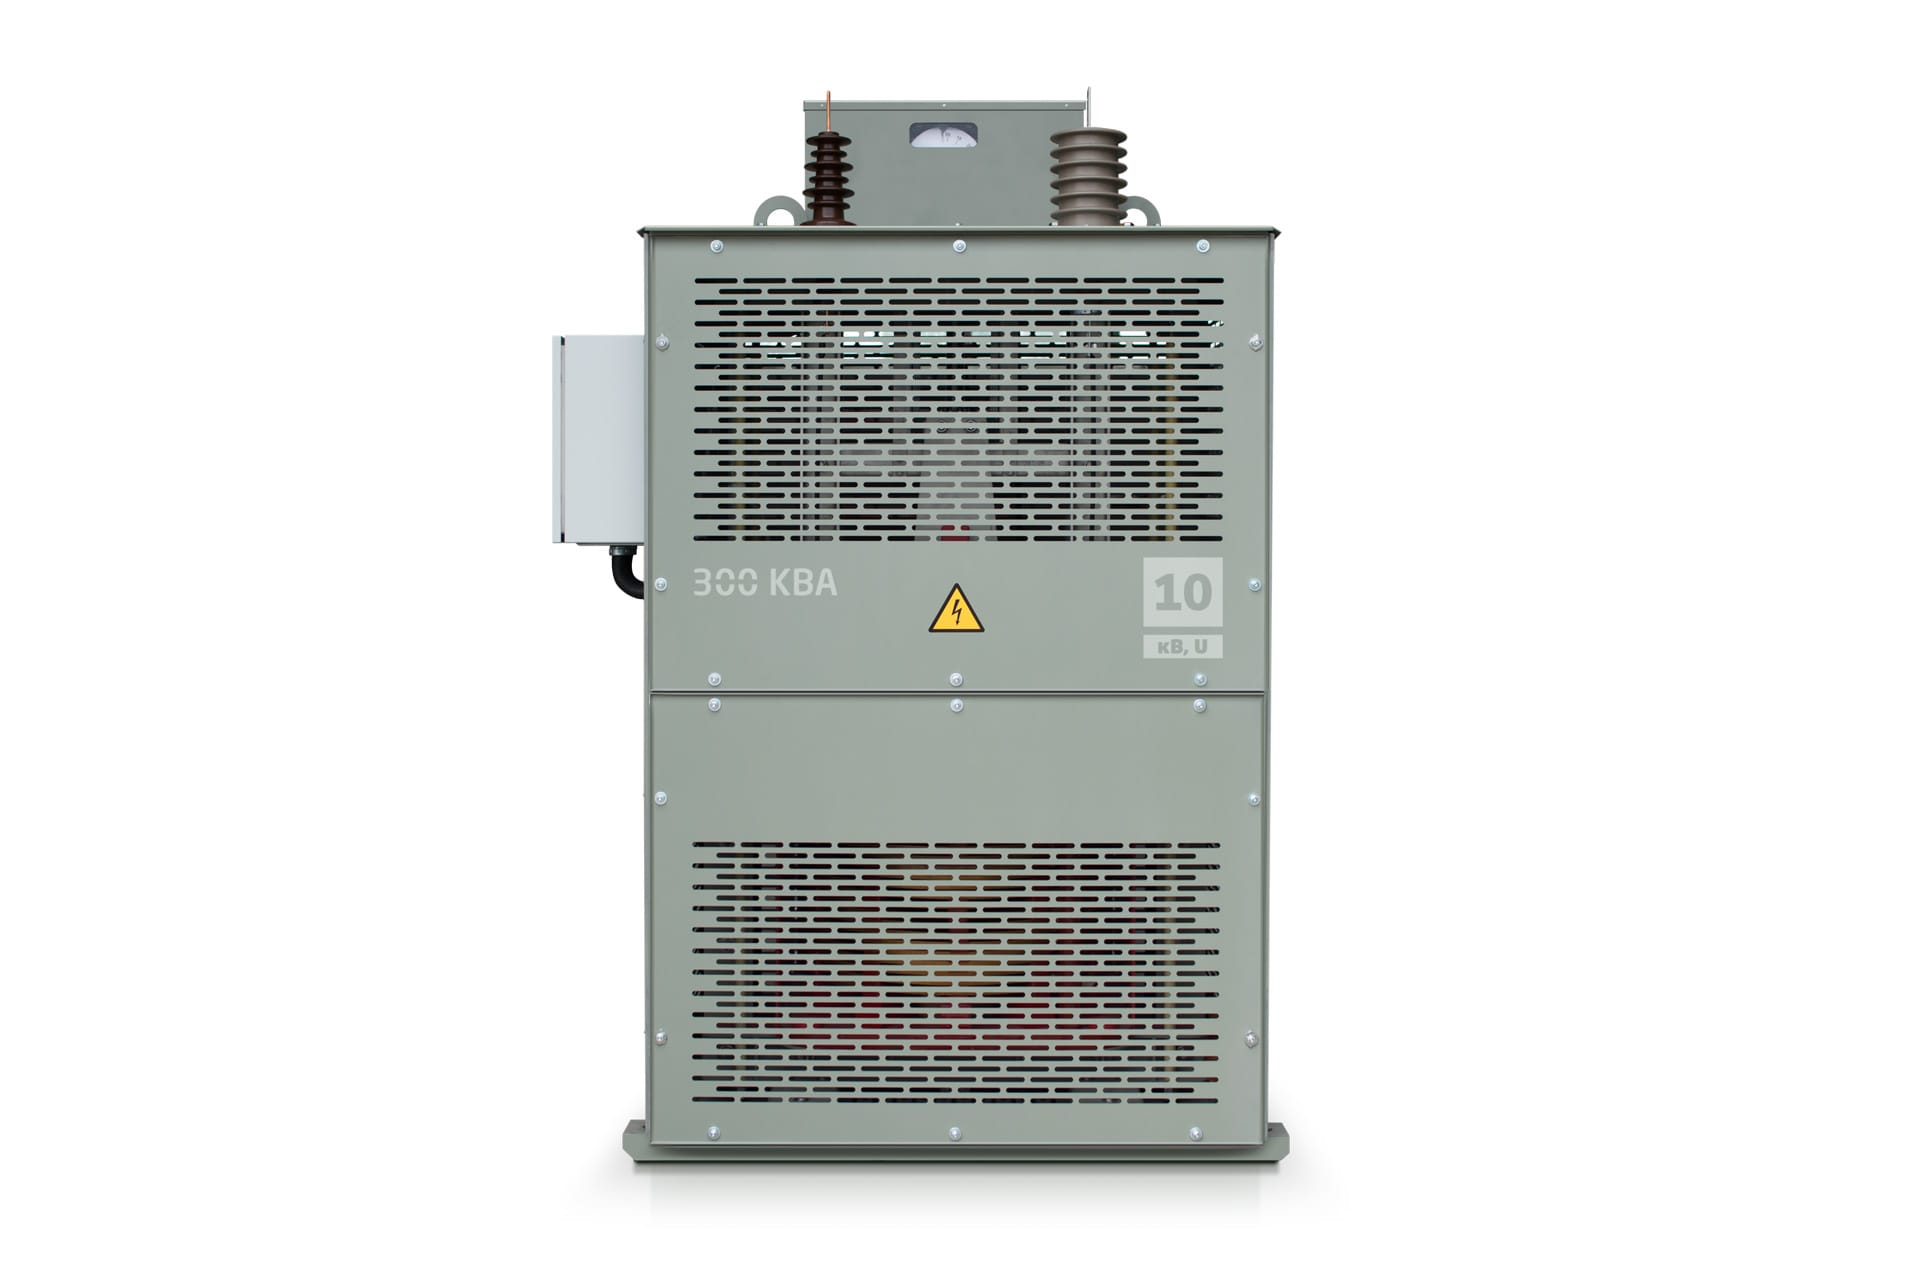 Ensons - Общий вид сухого дугогасящего реактора РЗДПОС 6(10) кВ